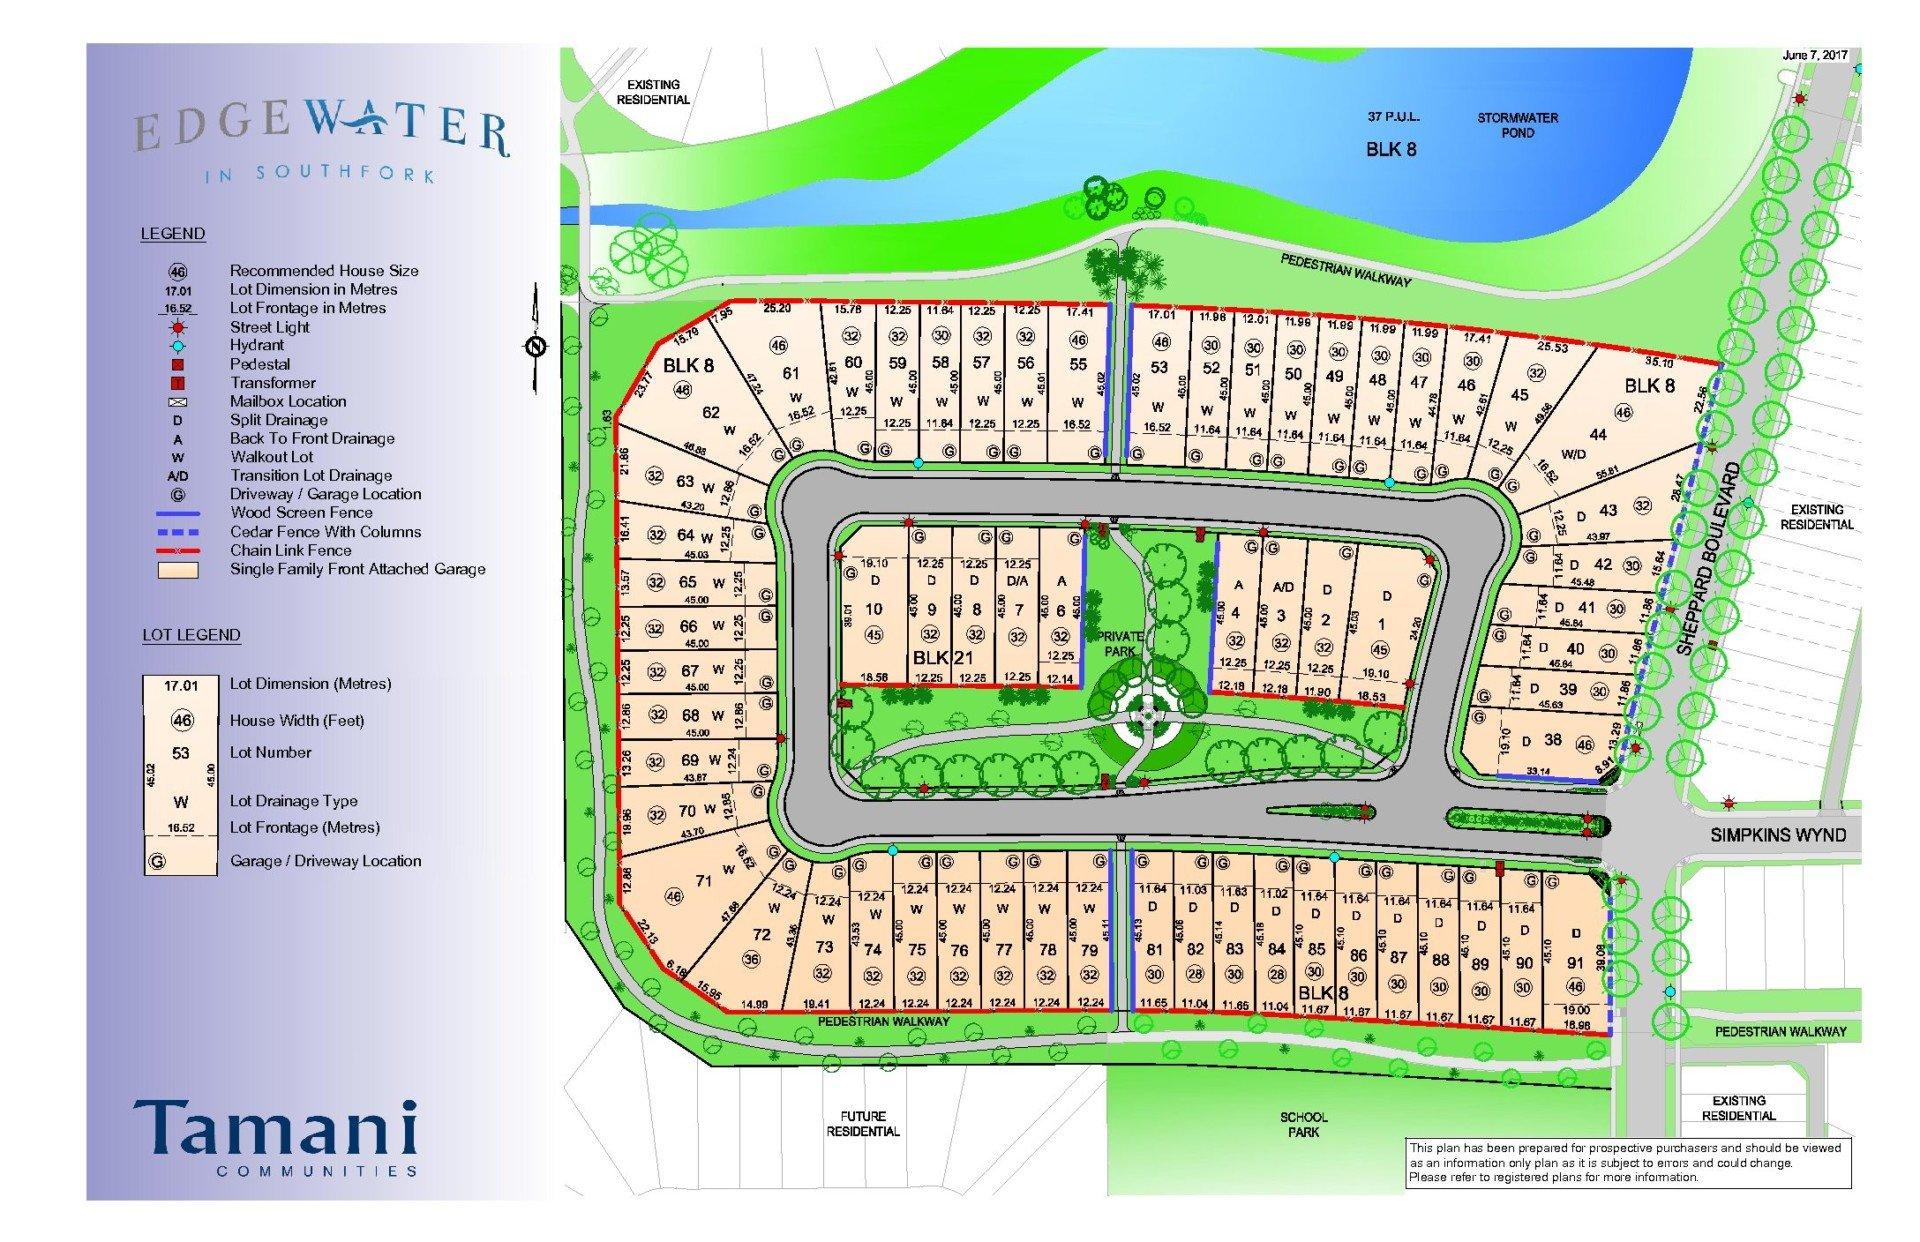 17-1204-MARKETING-PLAN-STAGE-9-WITH-NO-BORDER-pdf